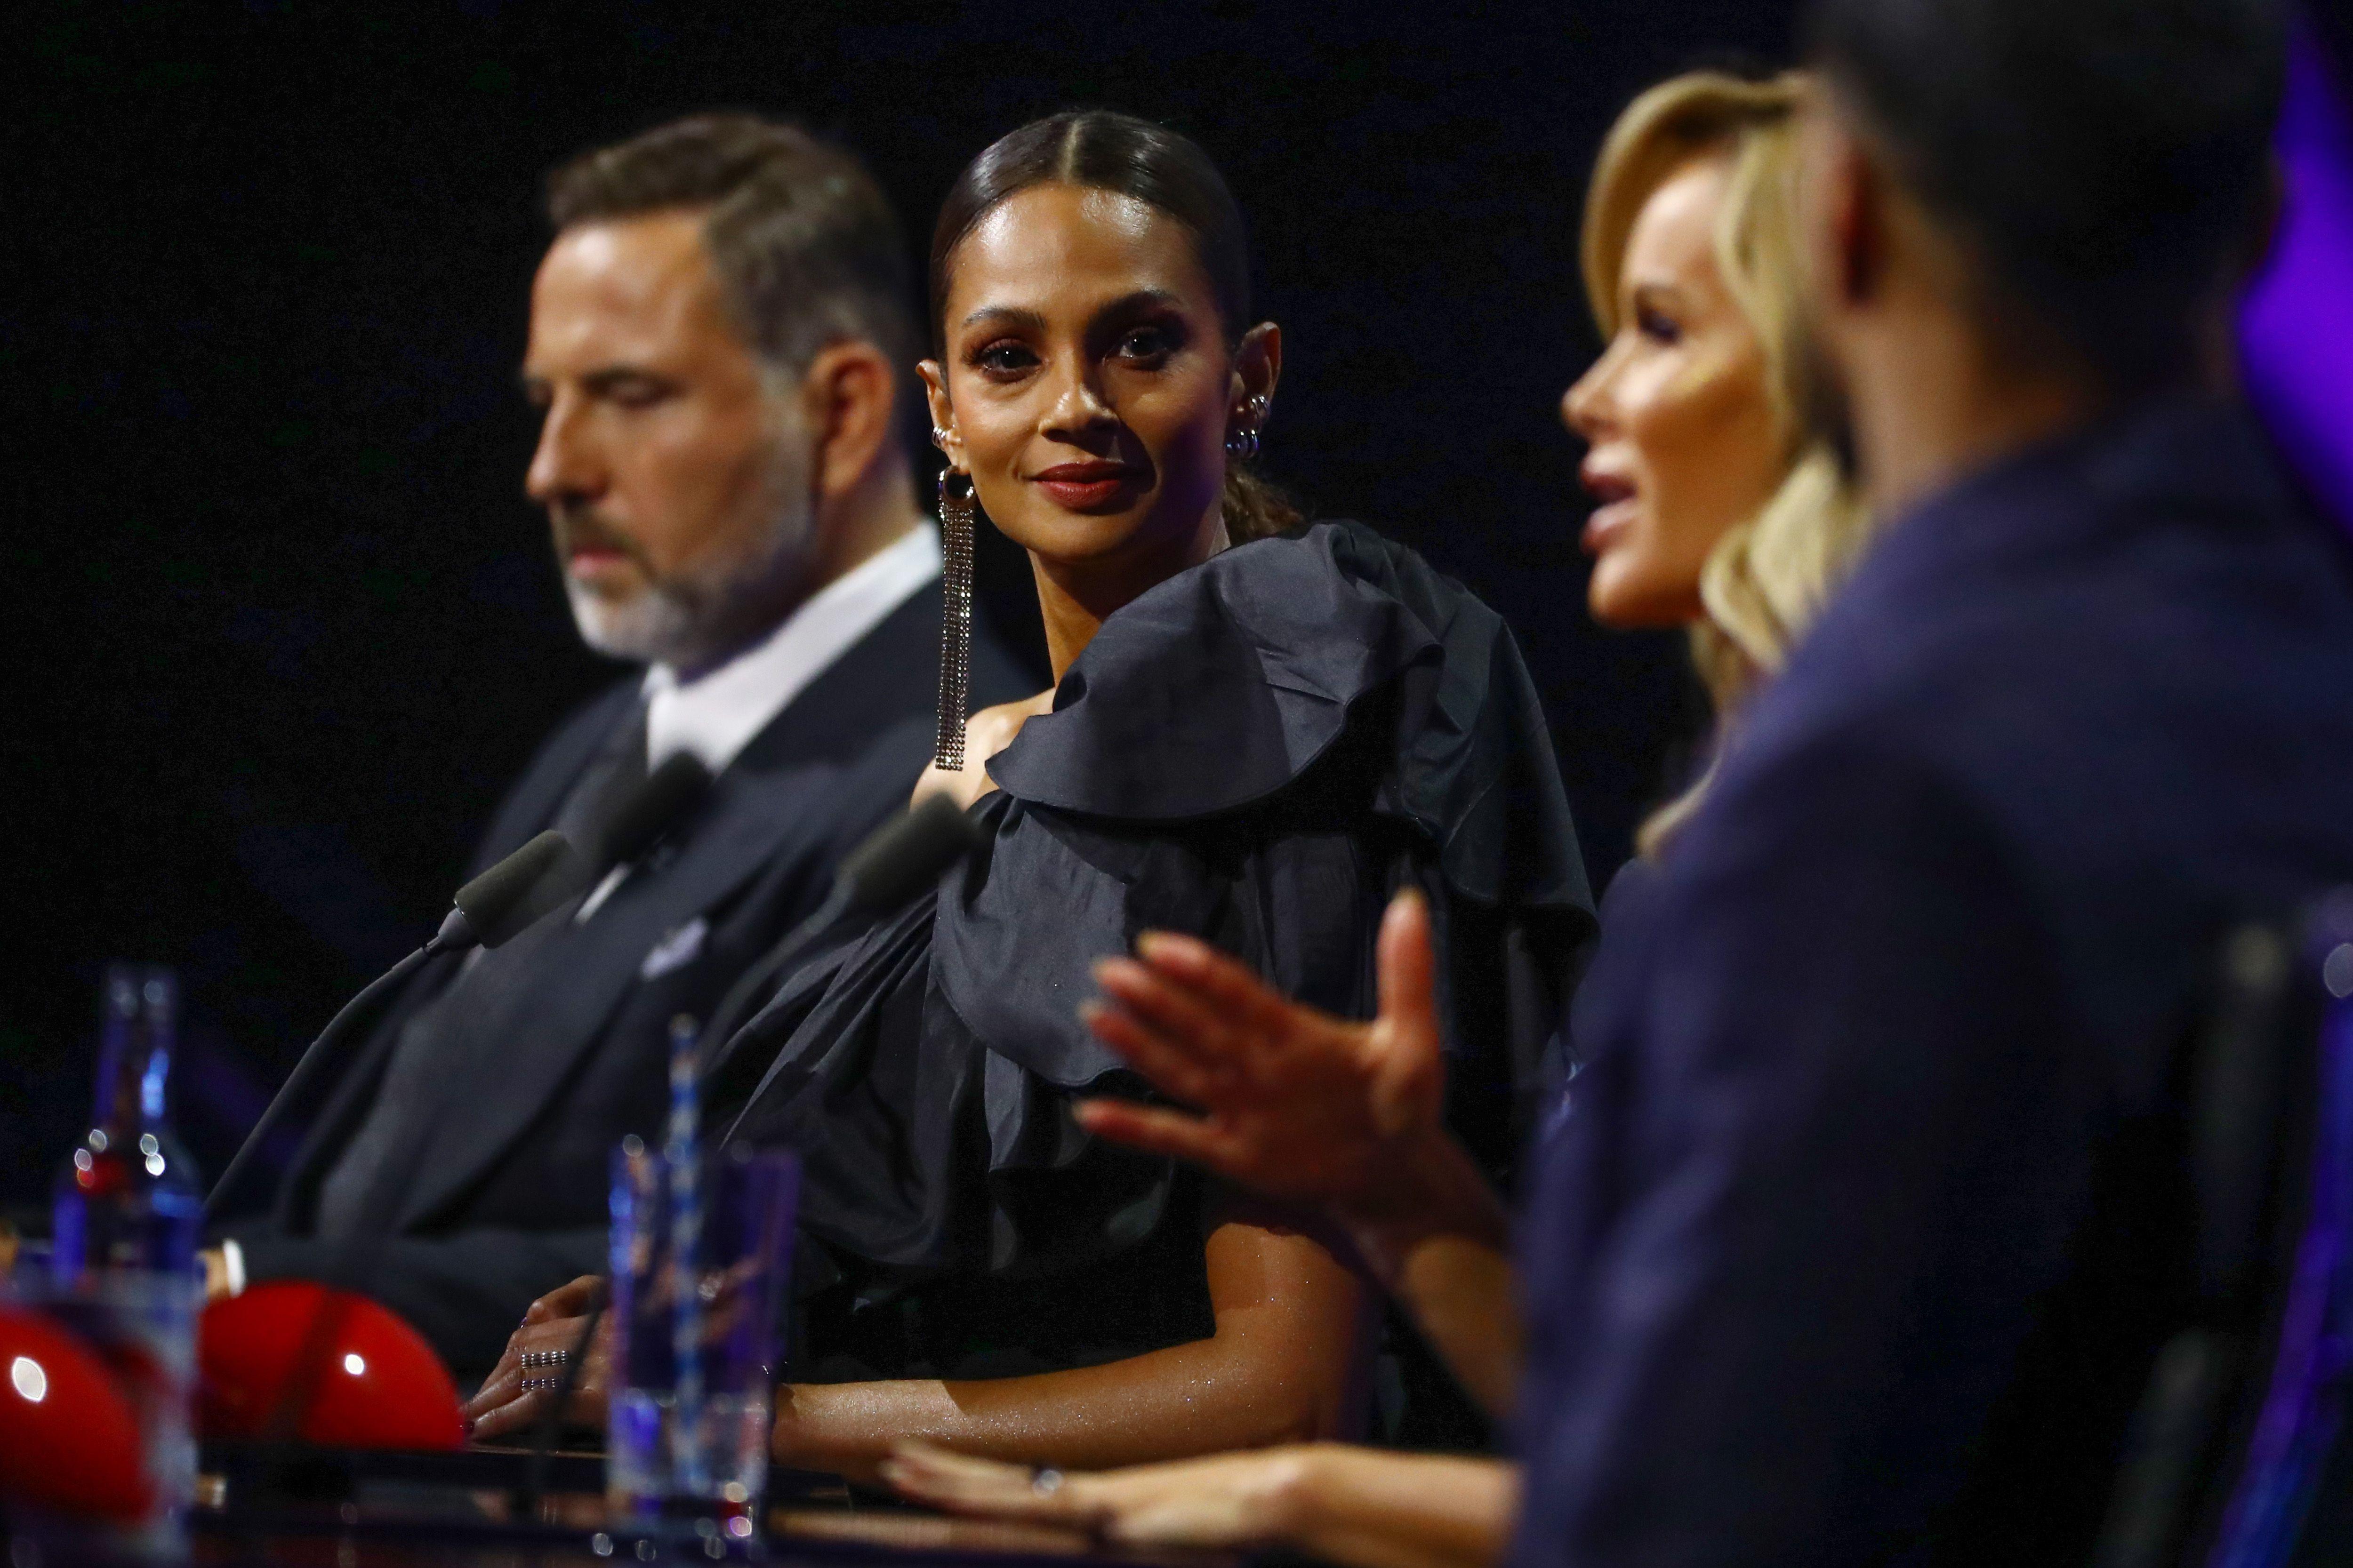 Britain S Got Talent 2020 Confirms The Fourth Finalist